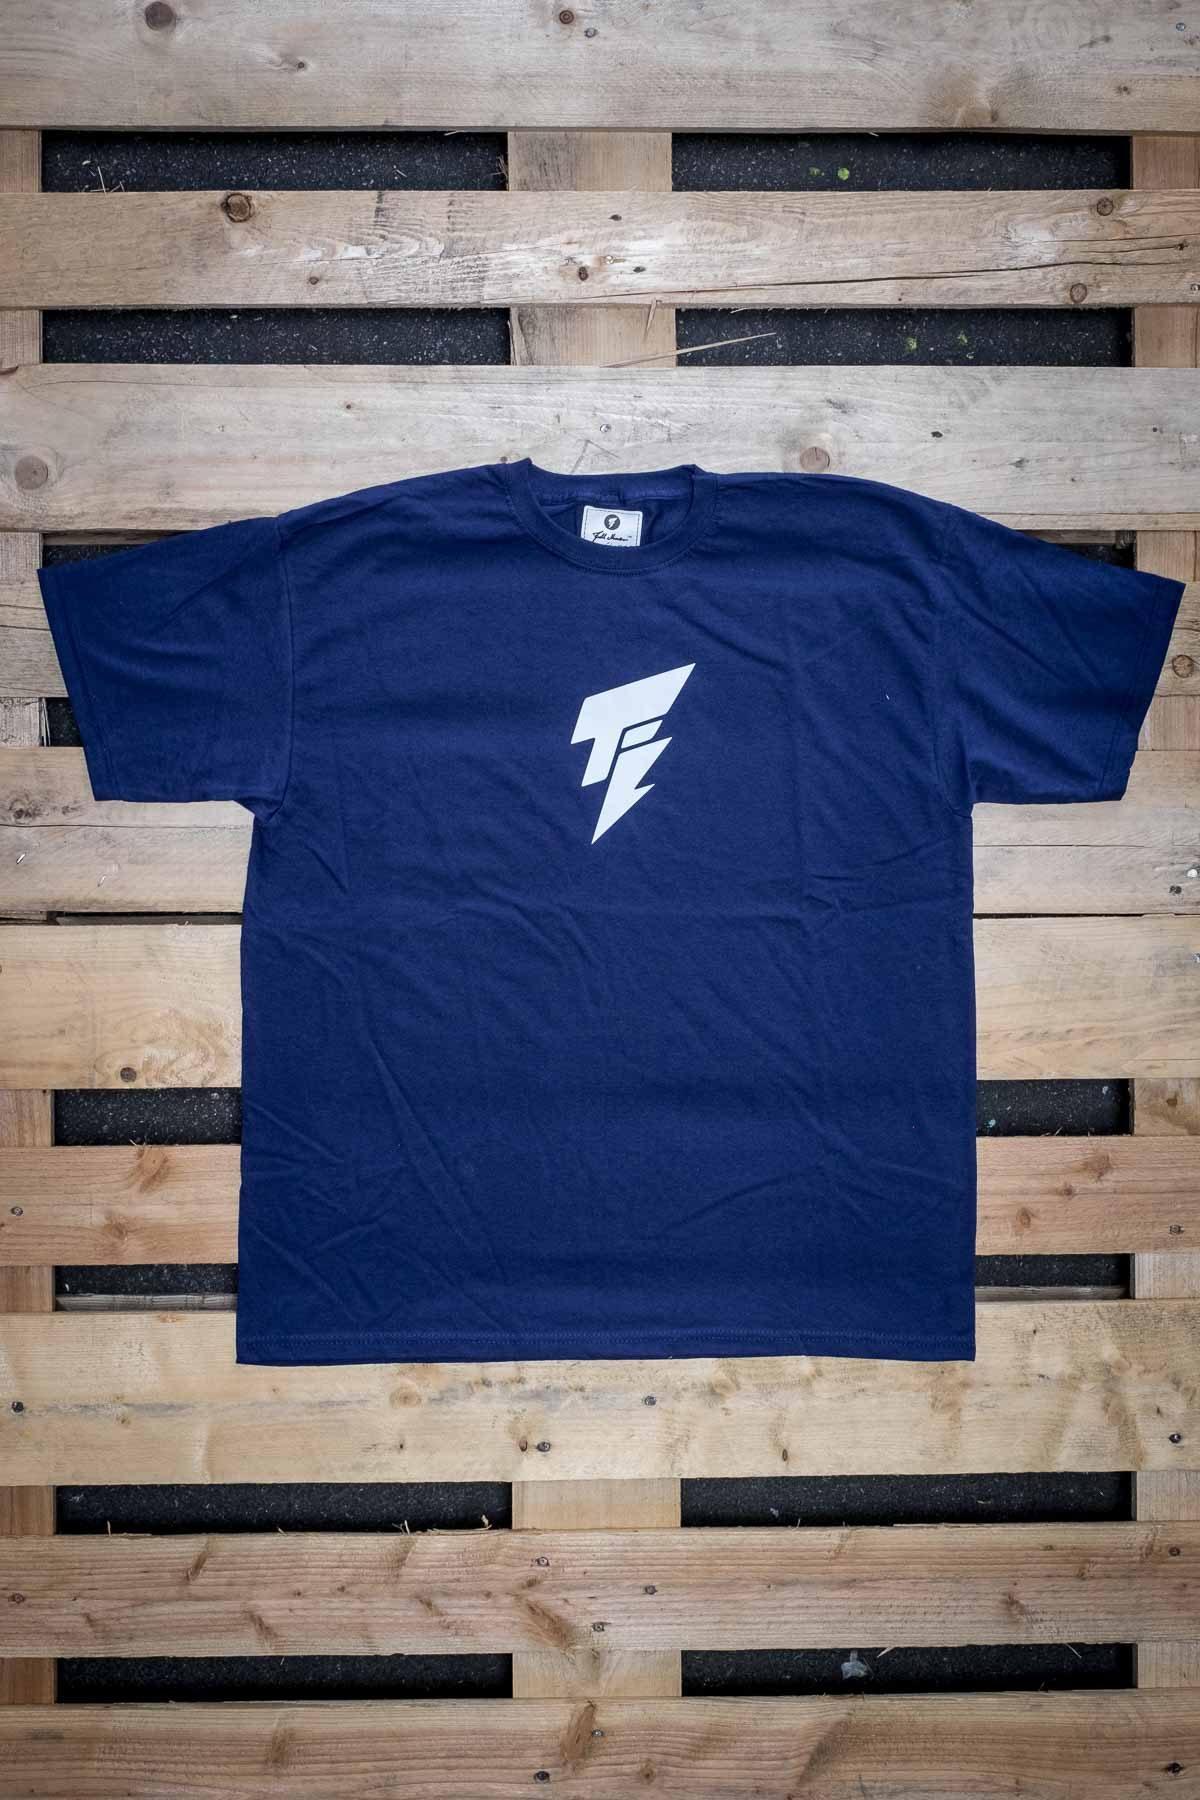 Full Mine Classic Tee Blue Front Typo Logo